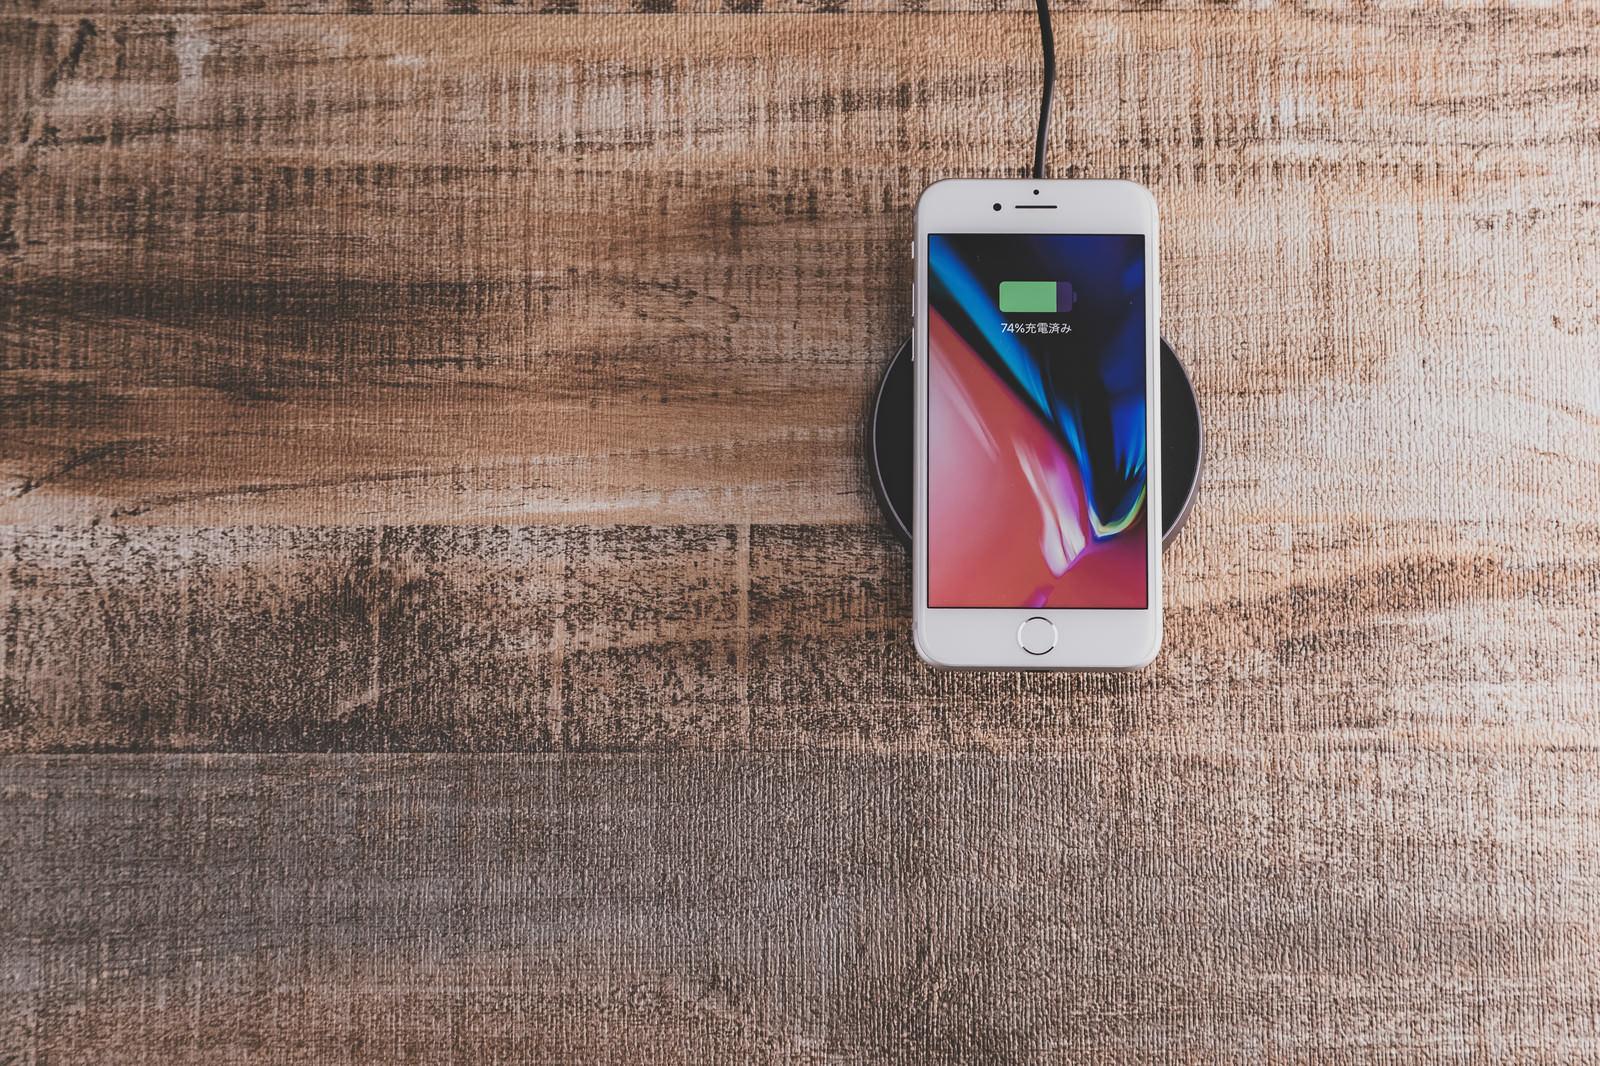 「iPhone をワイヤレス充電中 | 写真の無料素材・フリー素材 - ぱくたそ」の写真